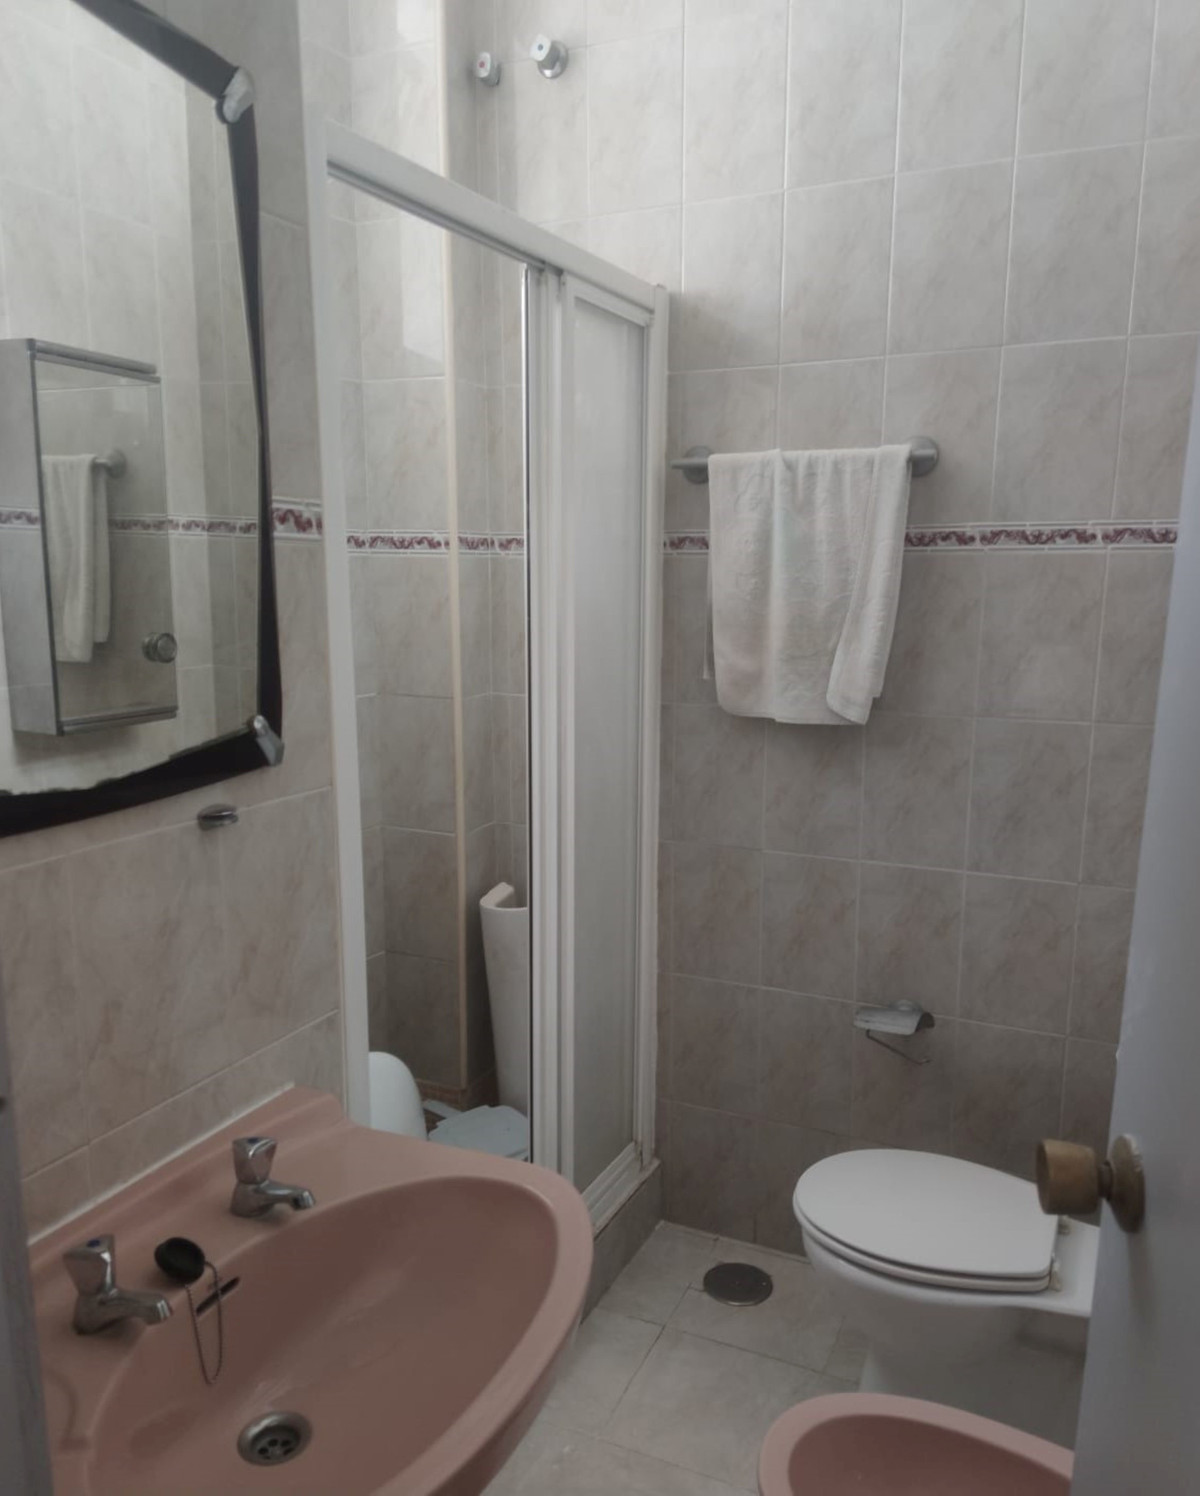 For Sale - Ground Floor Apartment - Coín - 6 - homeandhelp.com